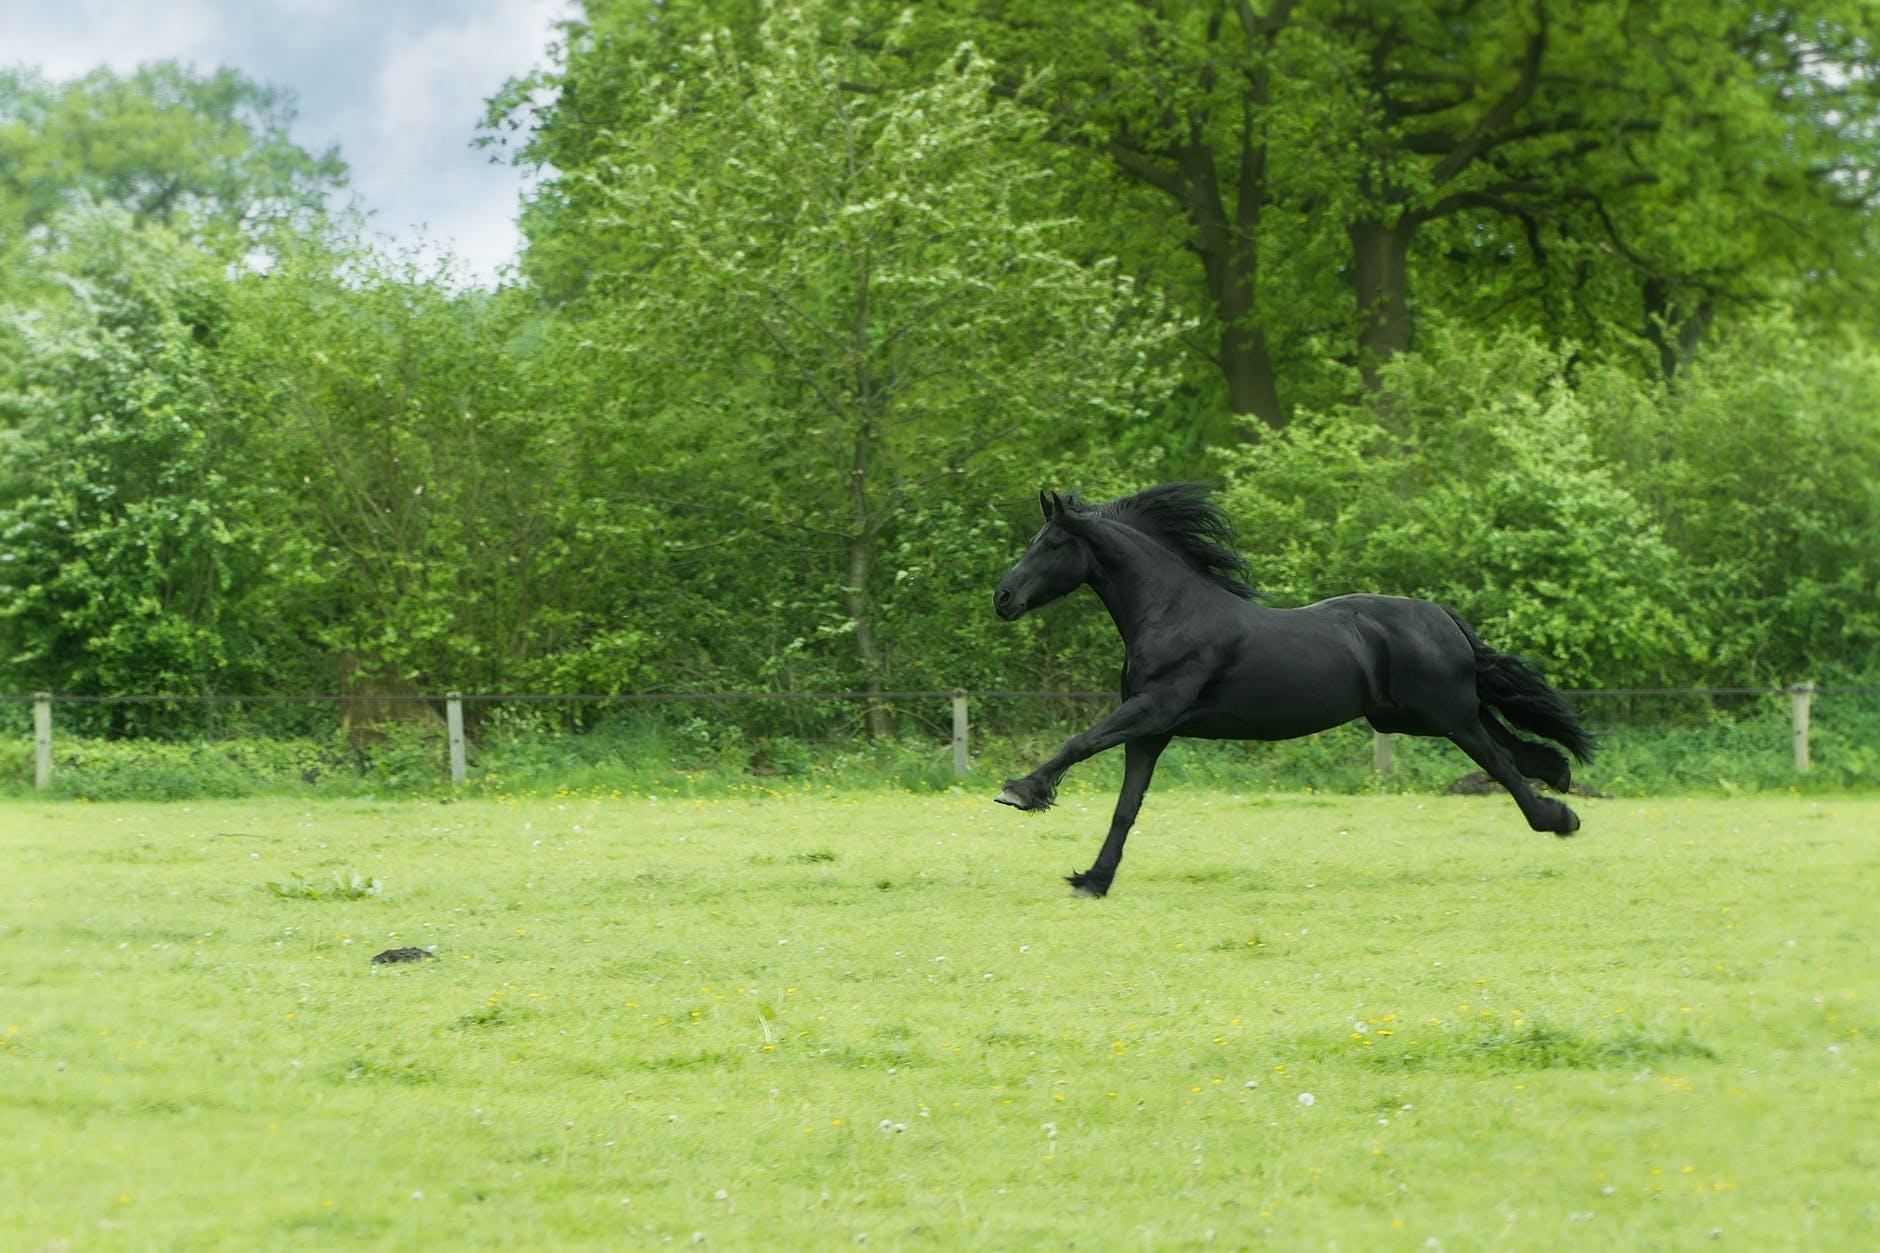 animal black countryside daylight